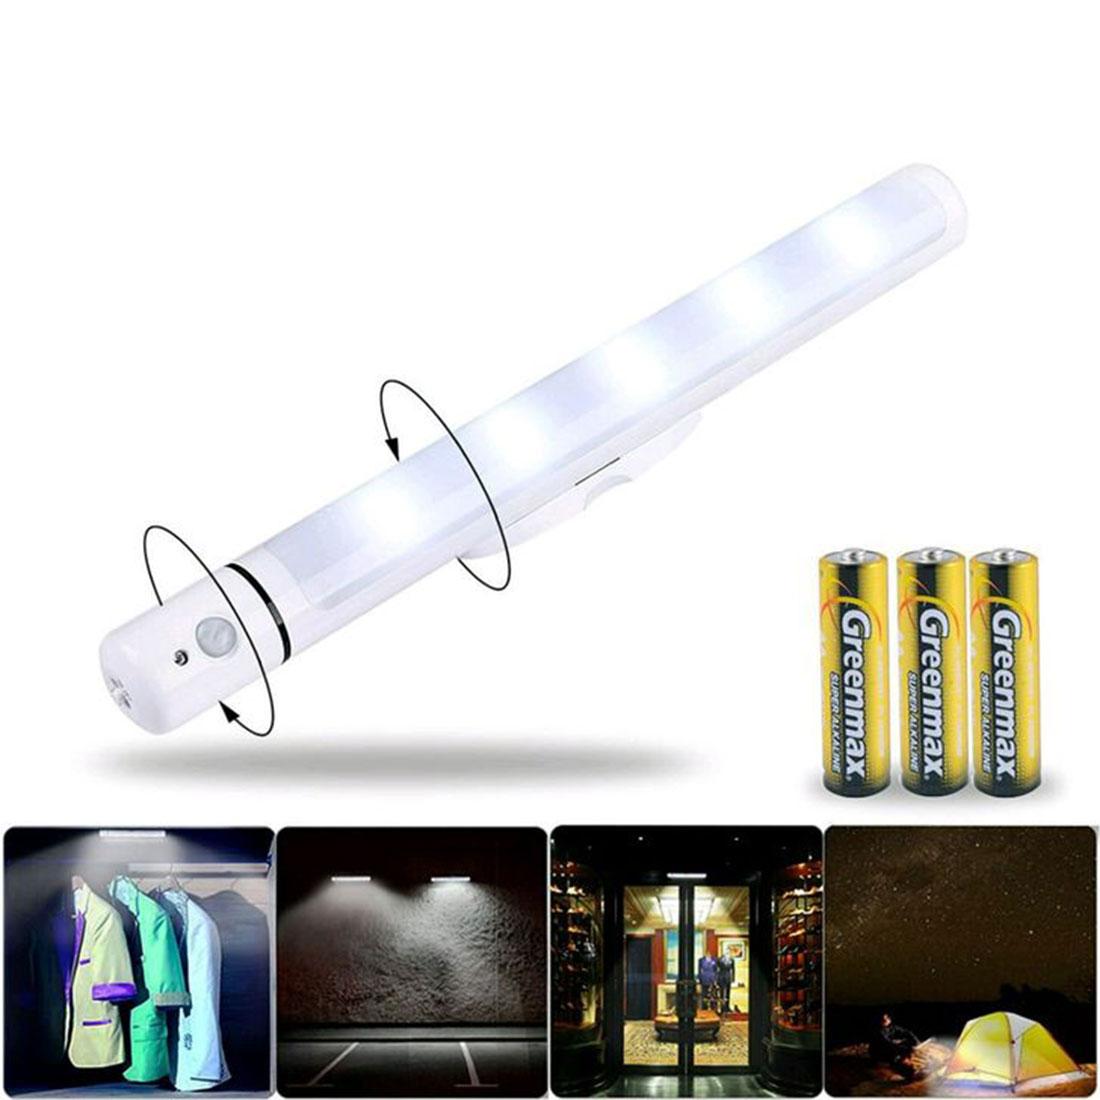 Wireless Motion Sensor Battery Operated Camping LED Kitchen Cabinet Garage Stairs Emergency Closet Lamp Flashlight Wall Night